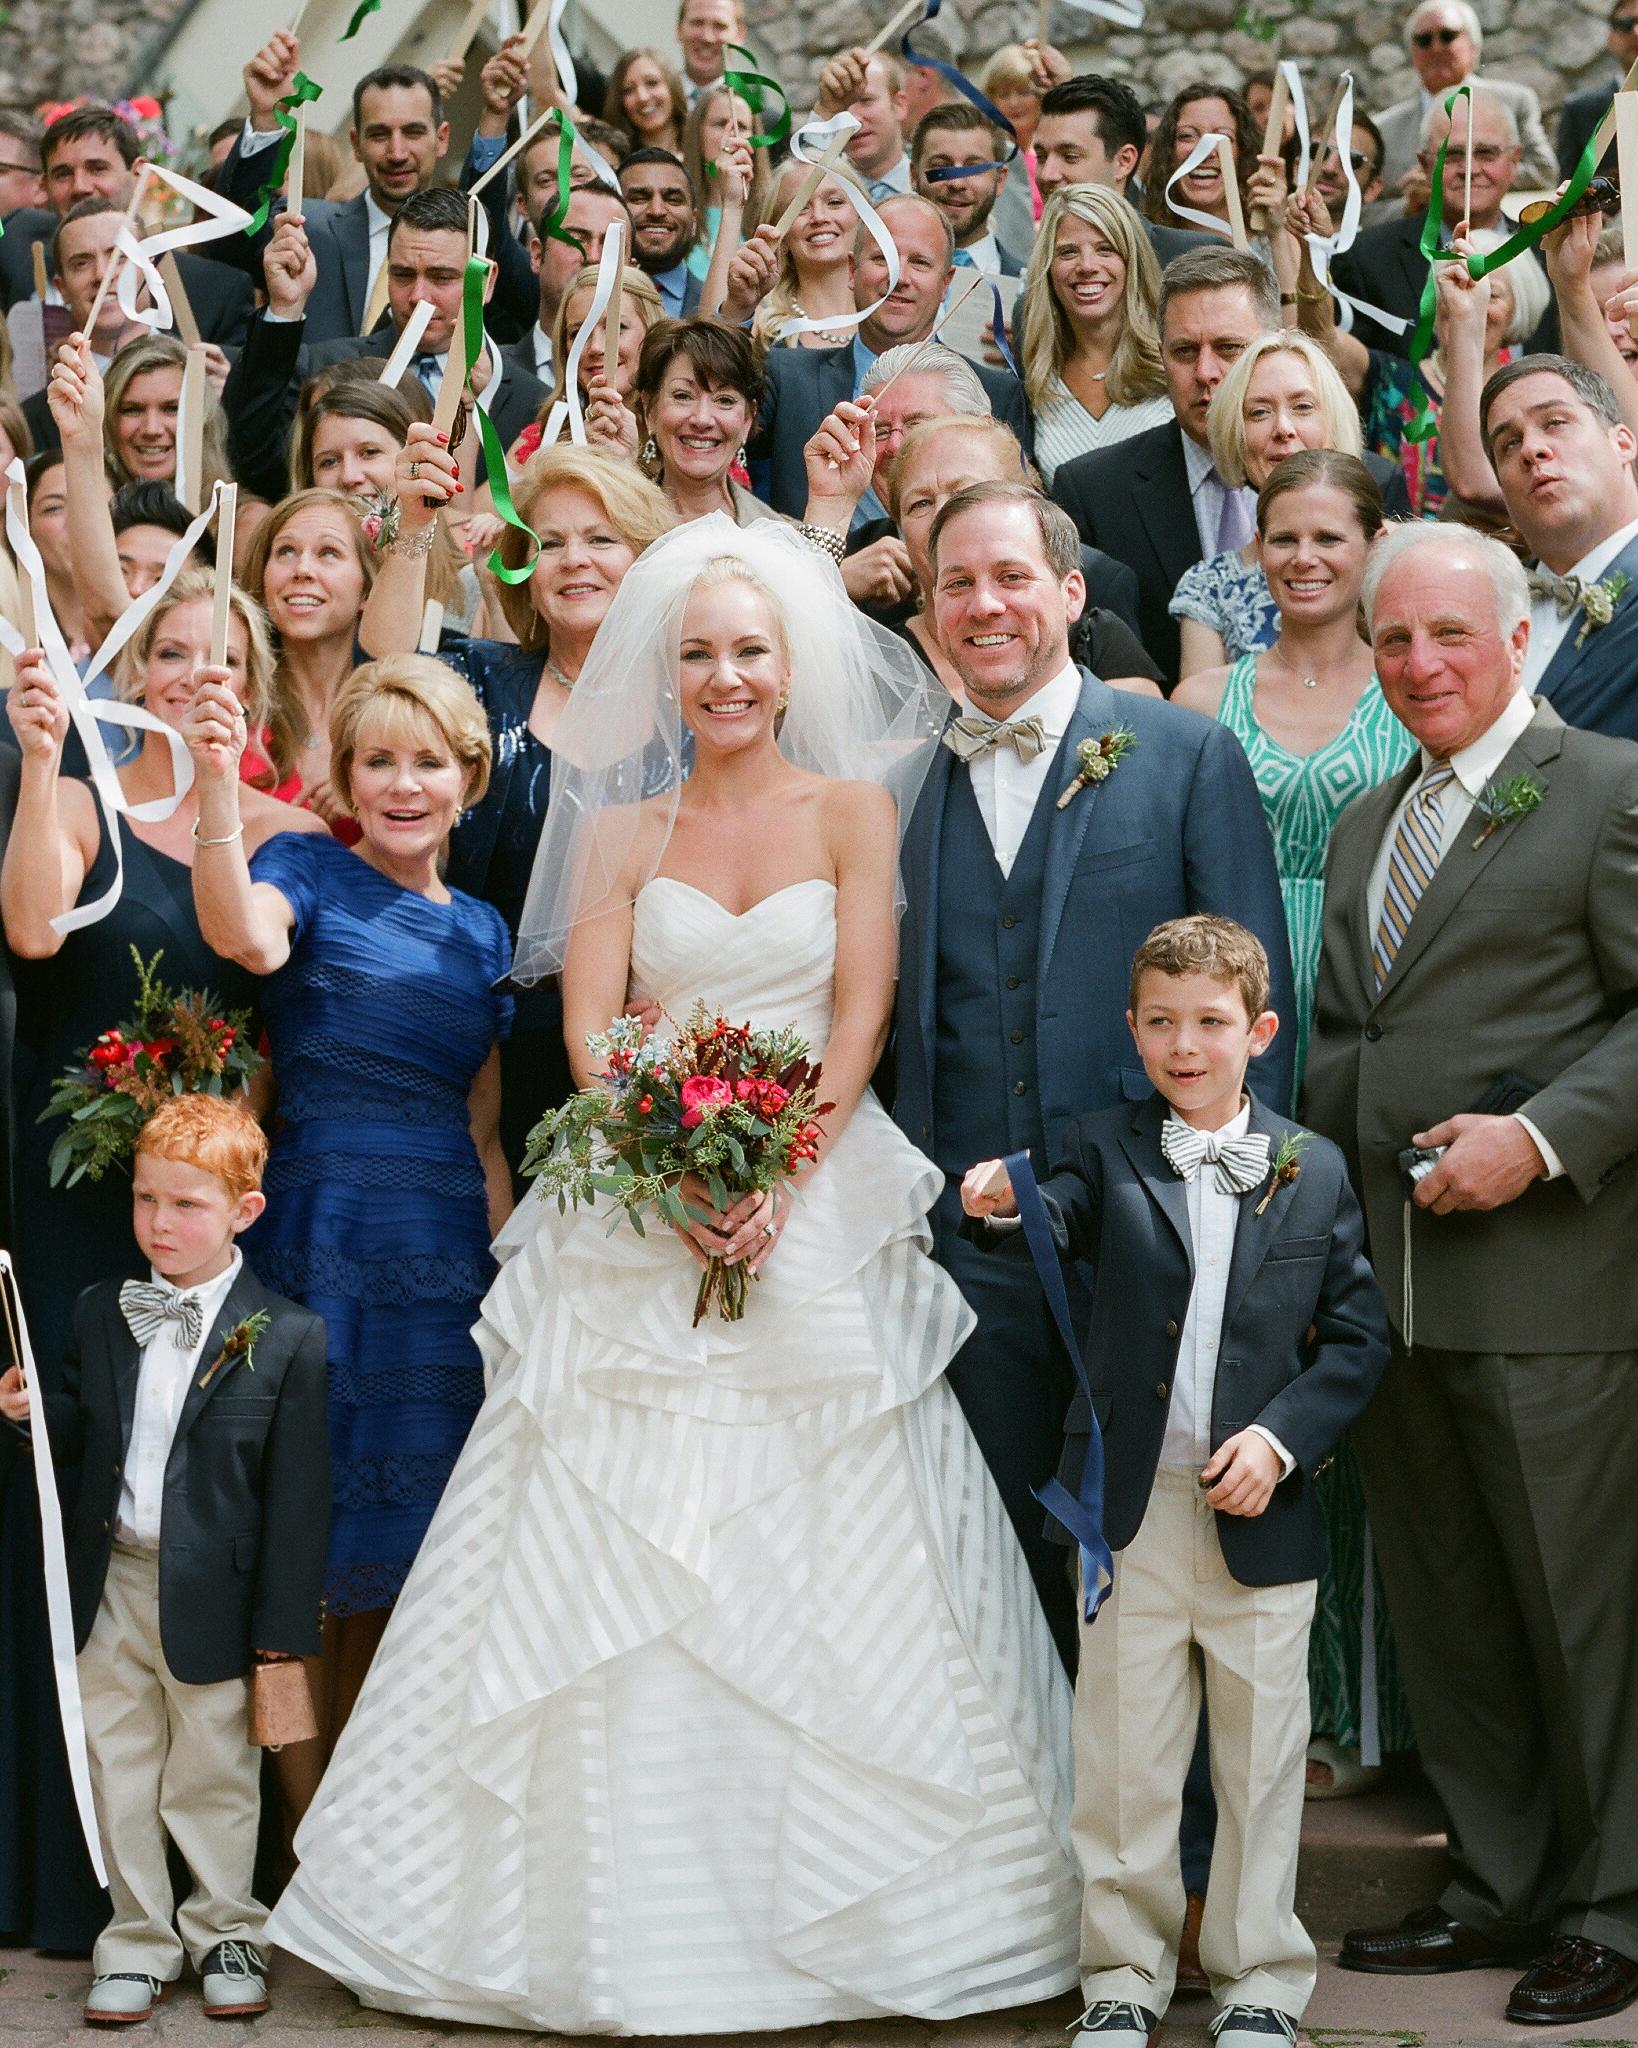 stacey-eric-wedding-group-06-s111513-1014.jpg